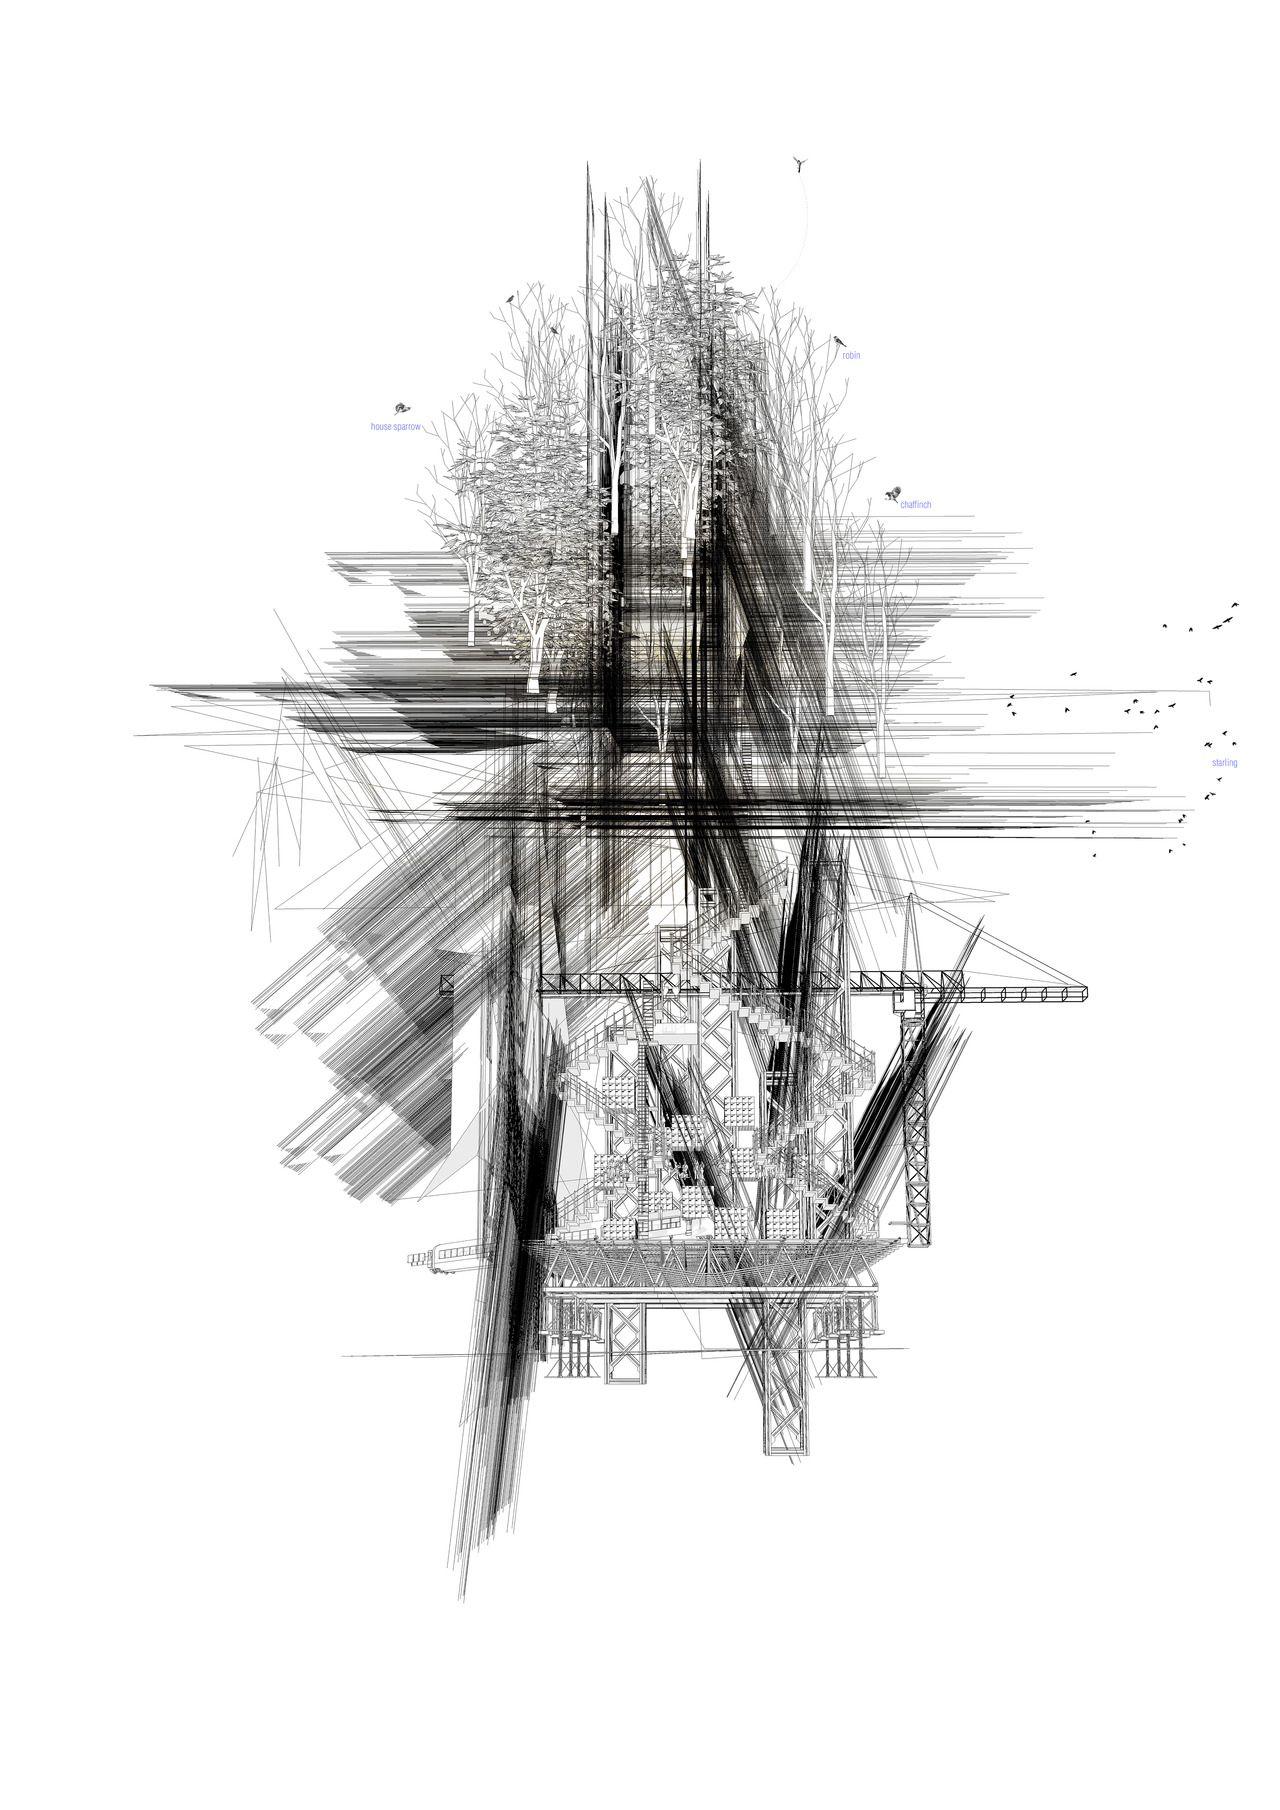 Untitled anoovab deka architektur pinterest architektur - Architektur skizzen zeichnen ...